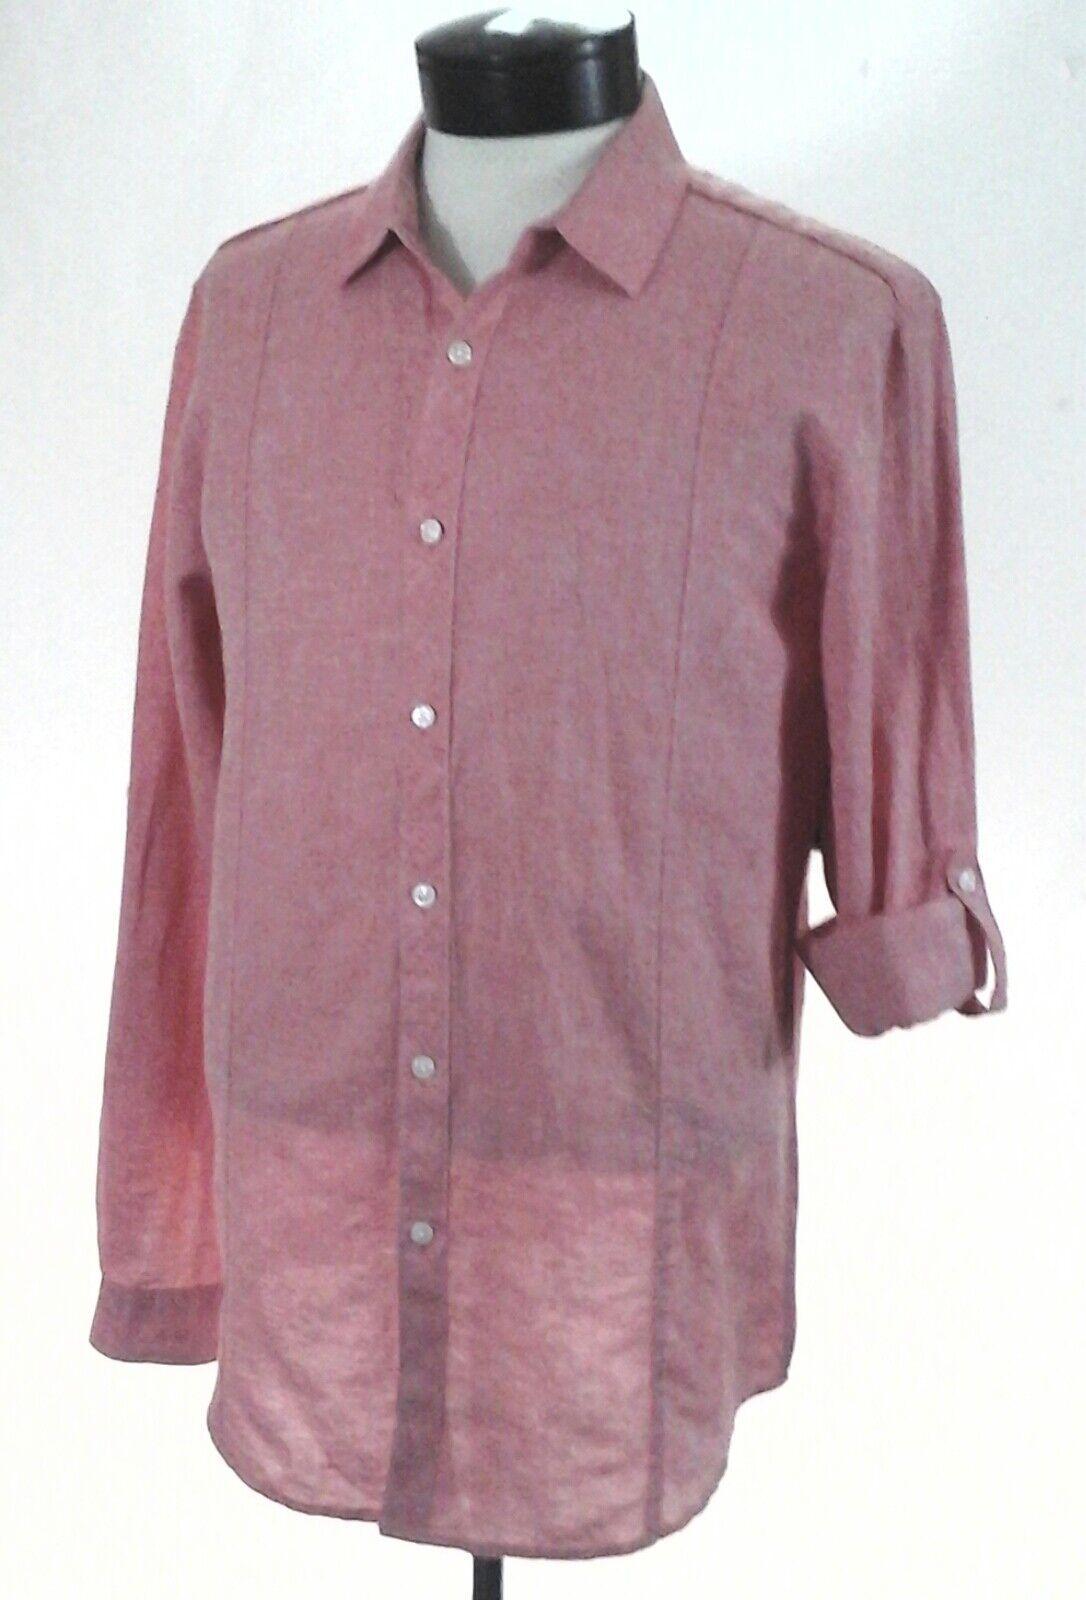 INC Linen Blend Shirt Coral Red orange Button Up L S Casual Summer Men's M